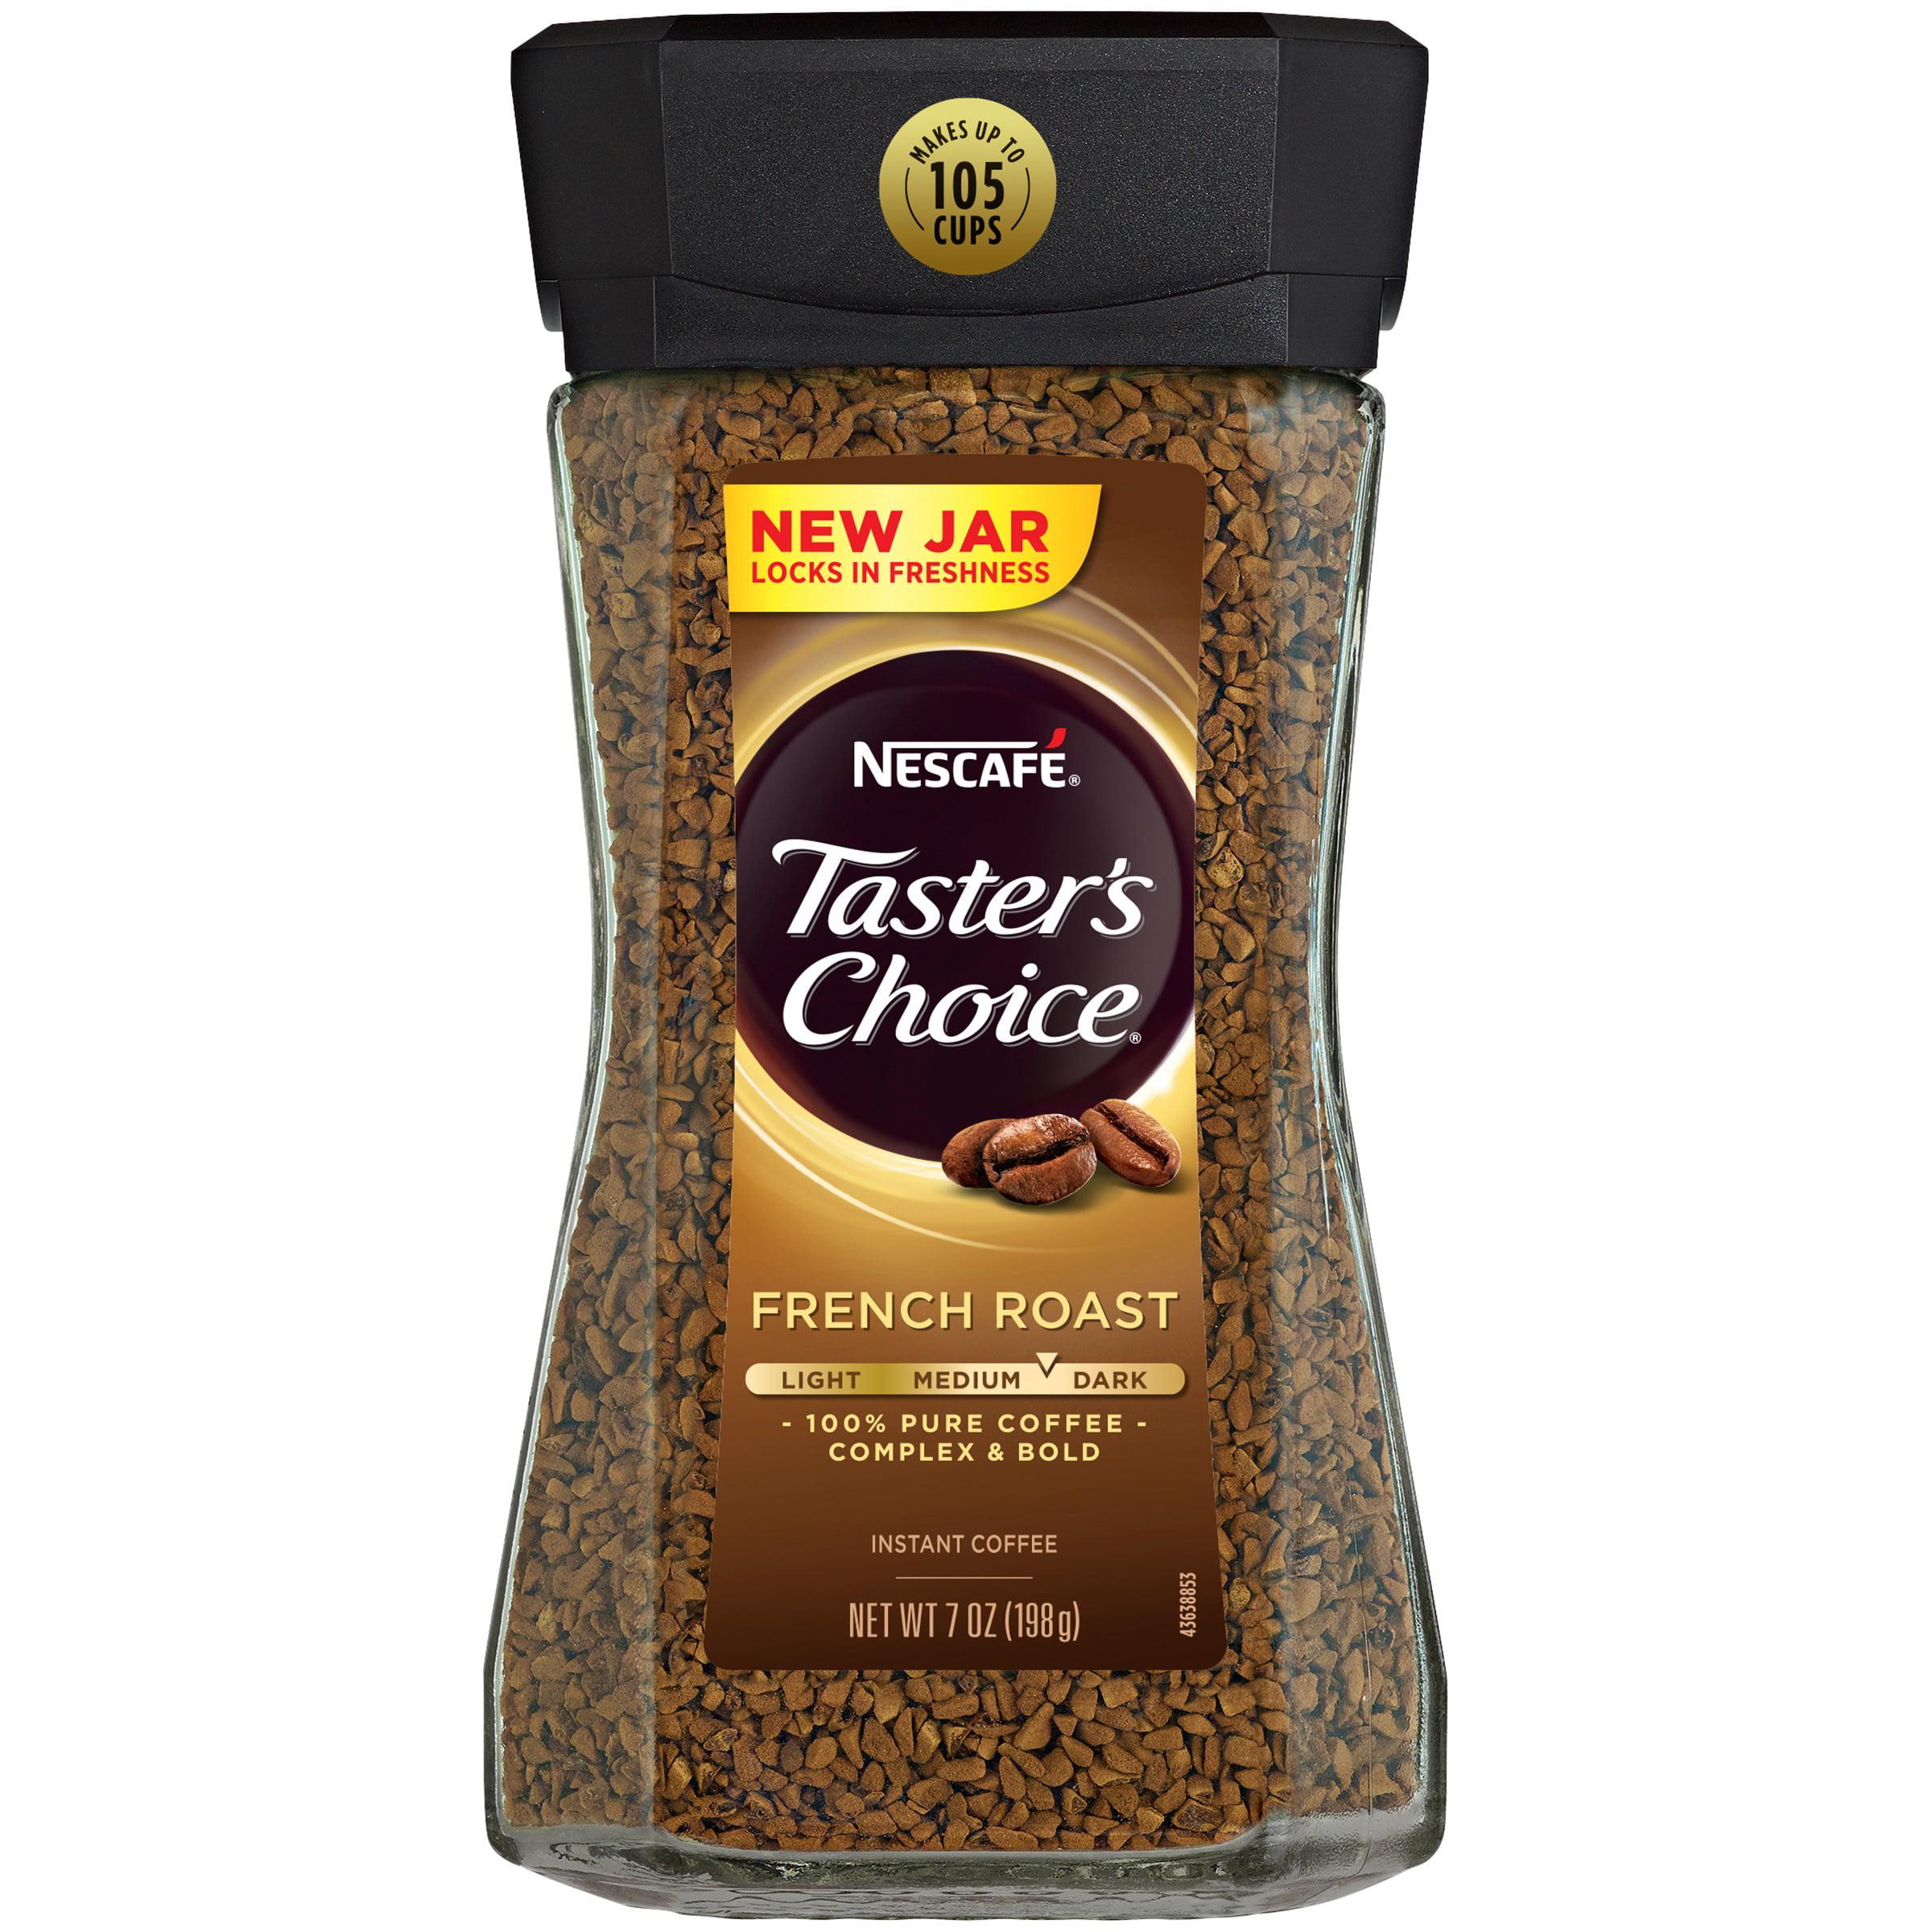 NESCAFE TASTER'S CHOICE Medium Dark French Roast Instant Coffee 7 oz. Jar